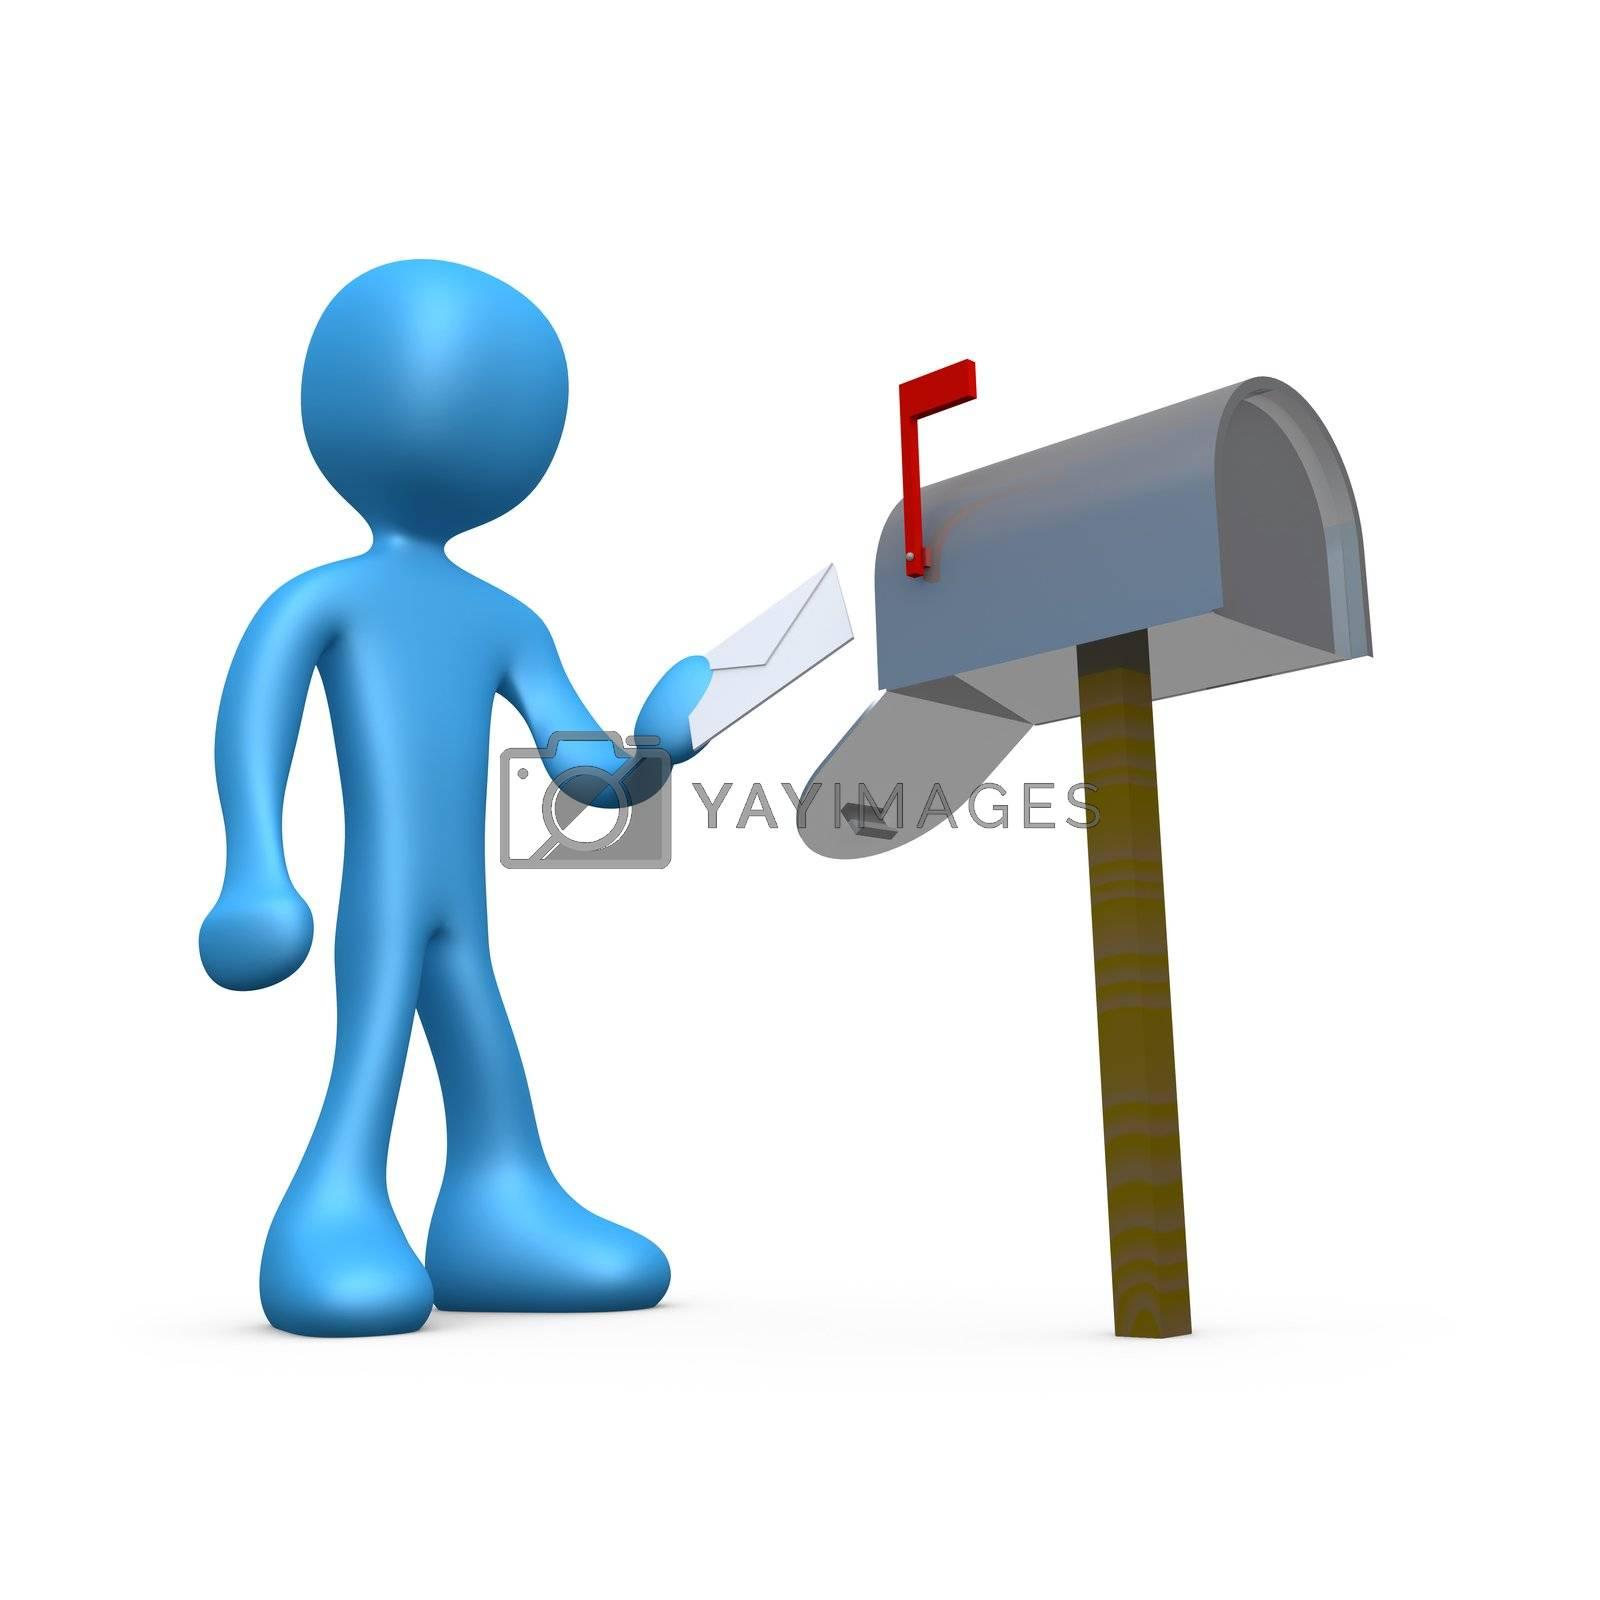 Mailbox by 3pod